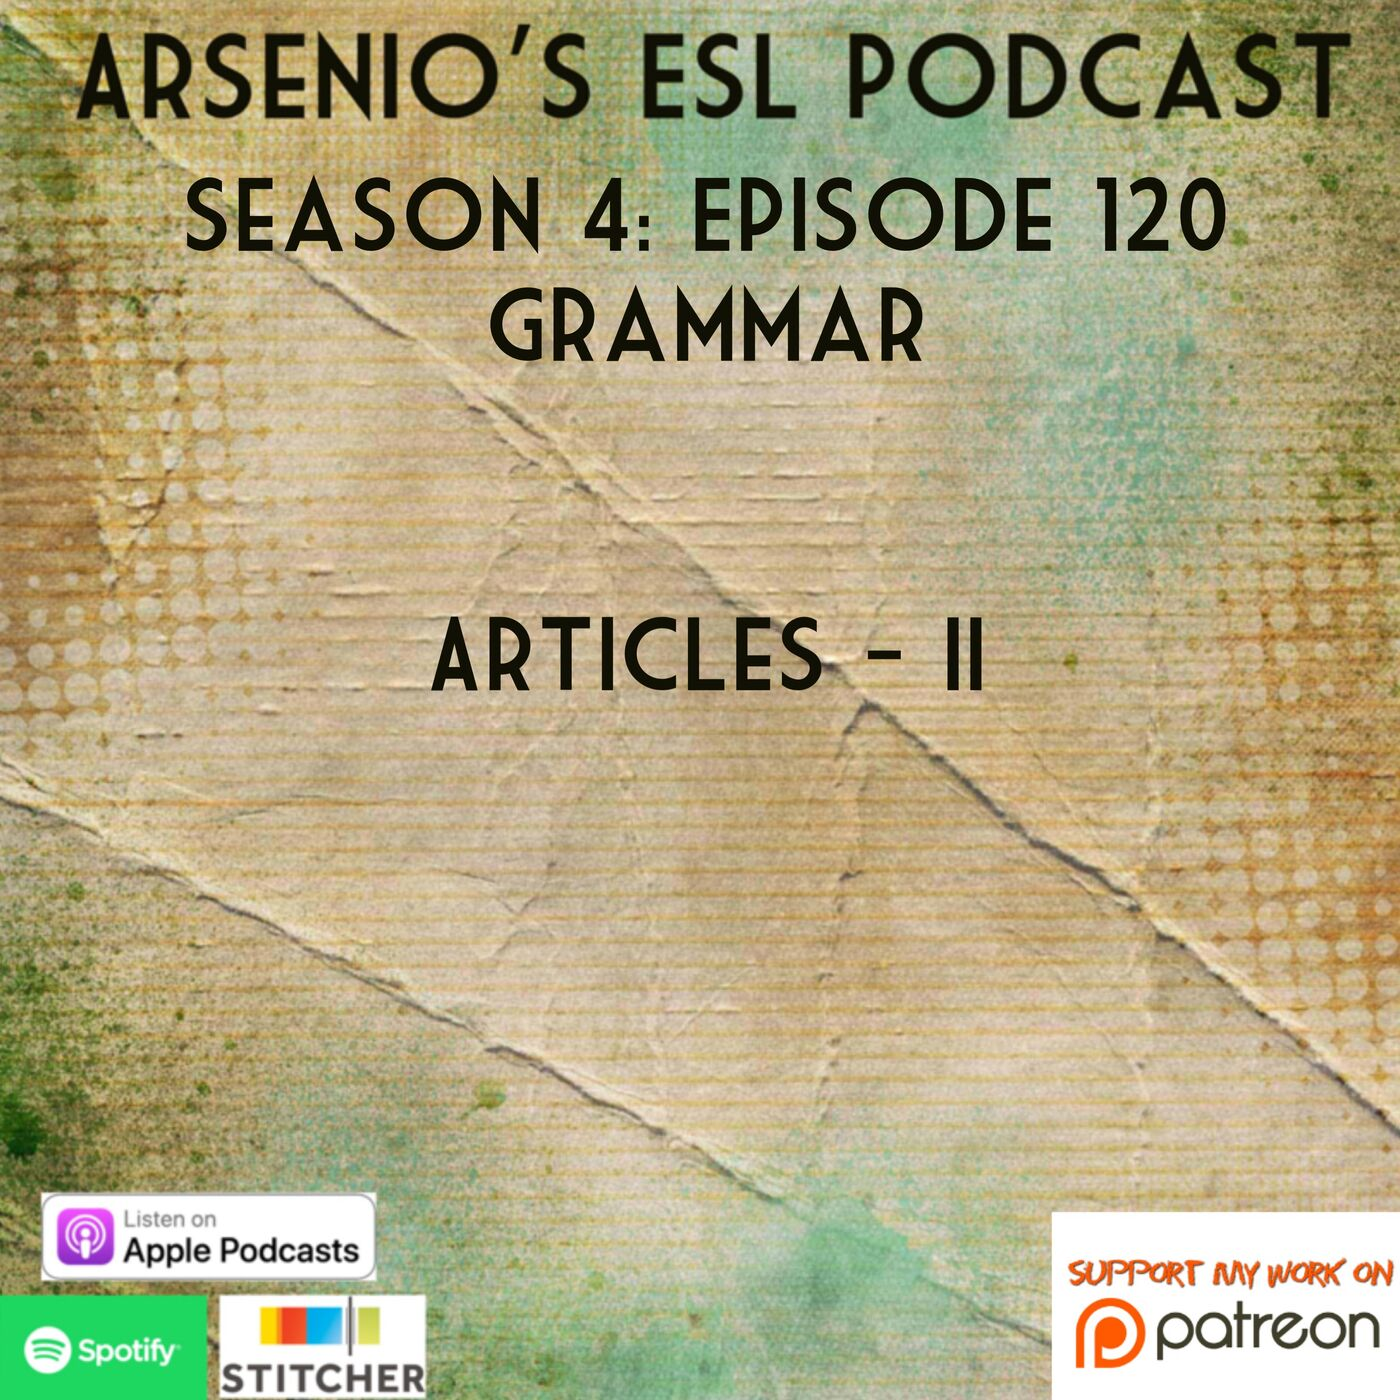 Arsenio's ESL Podcast: Season 4 - Episode 120 - Grammar - Articles II